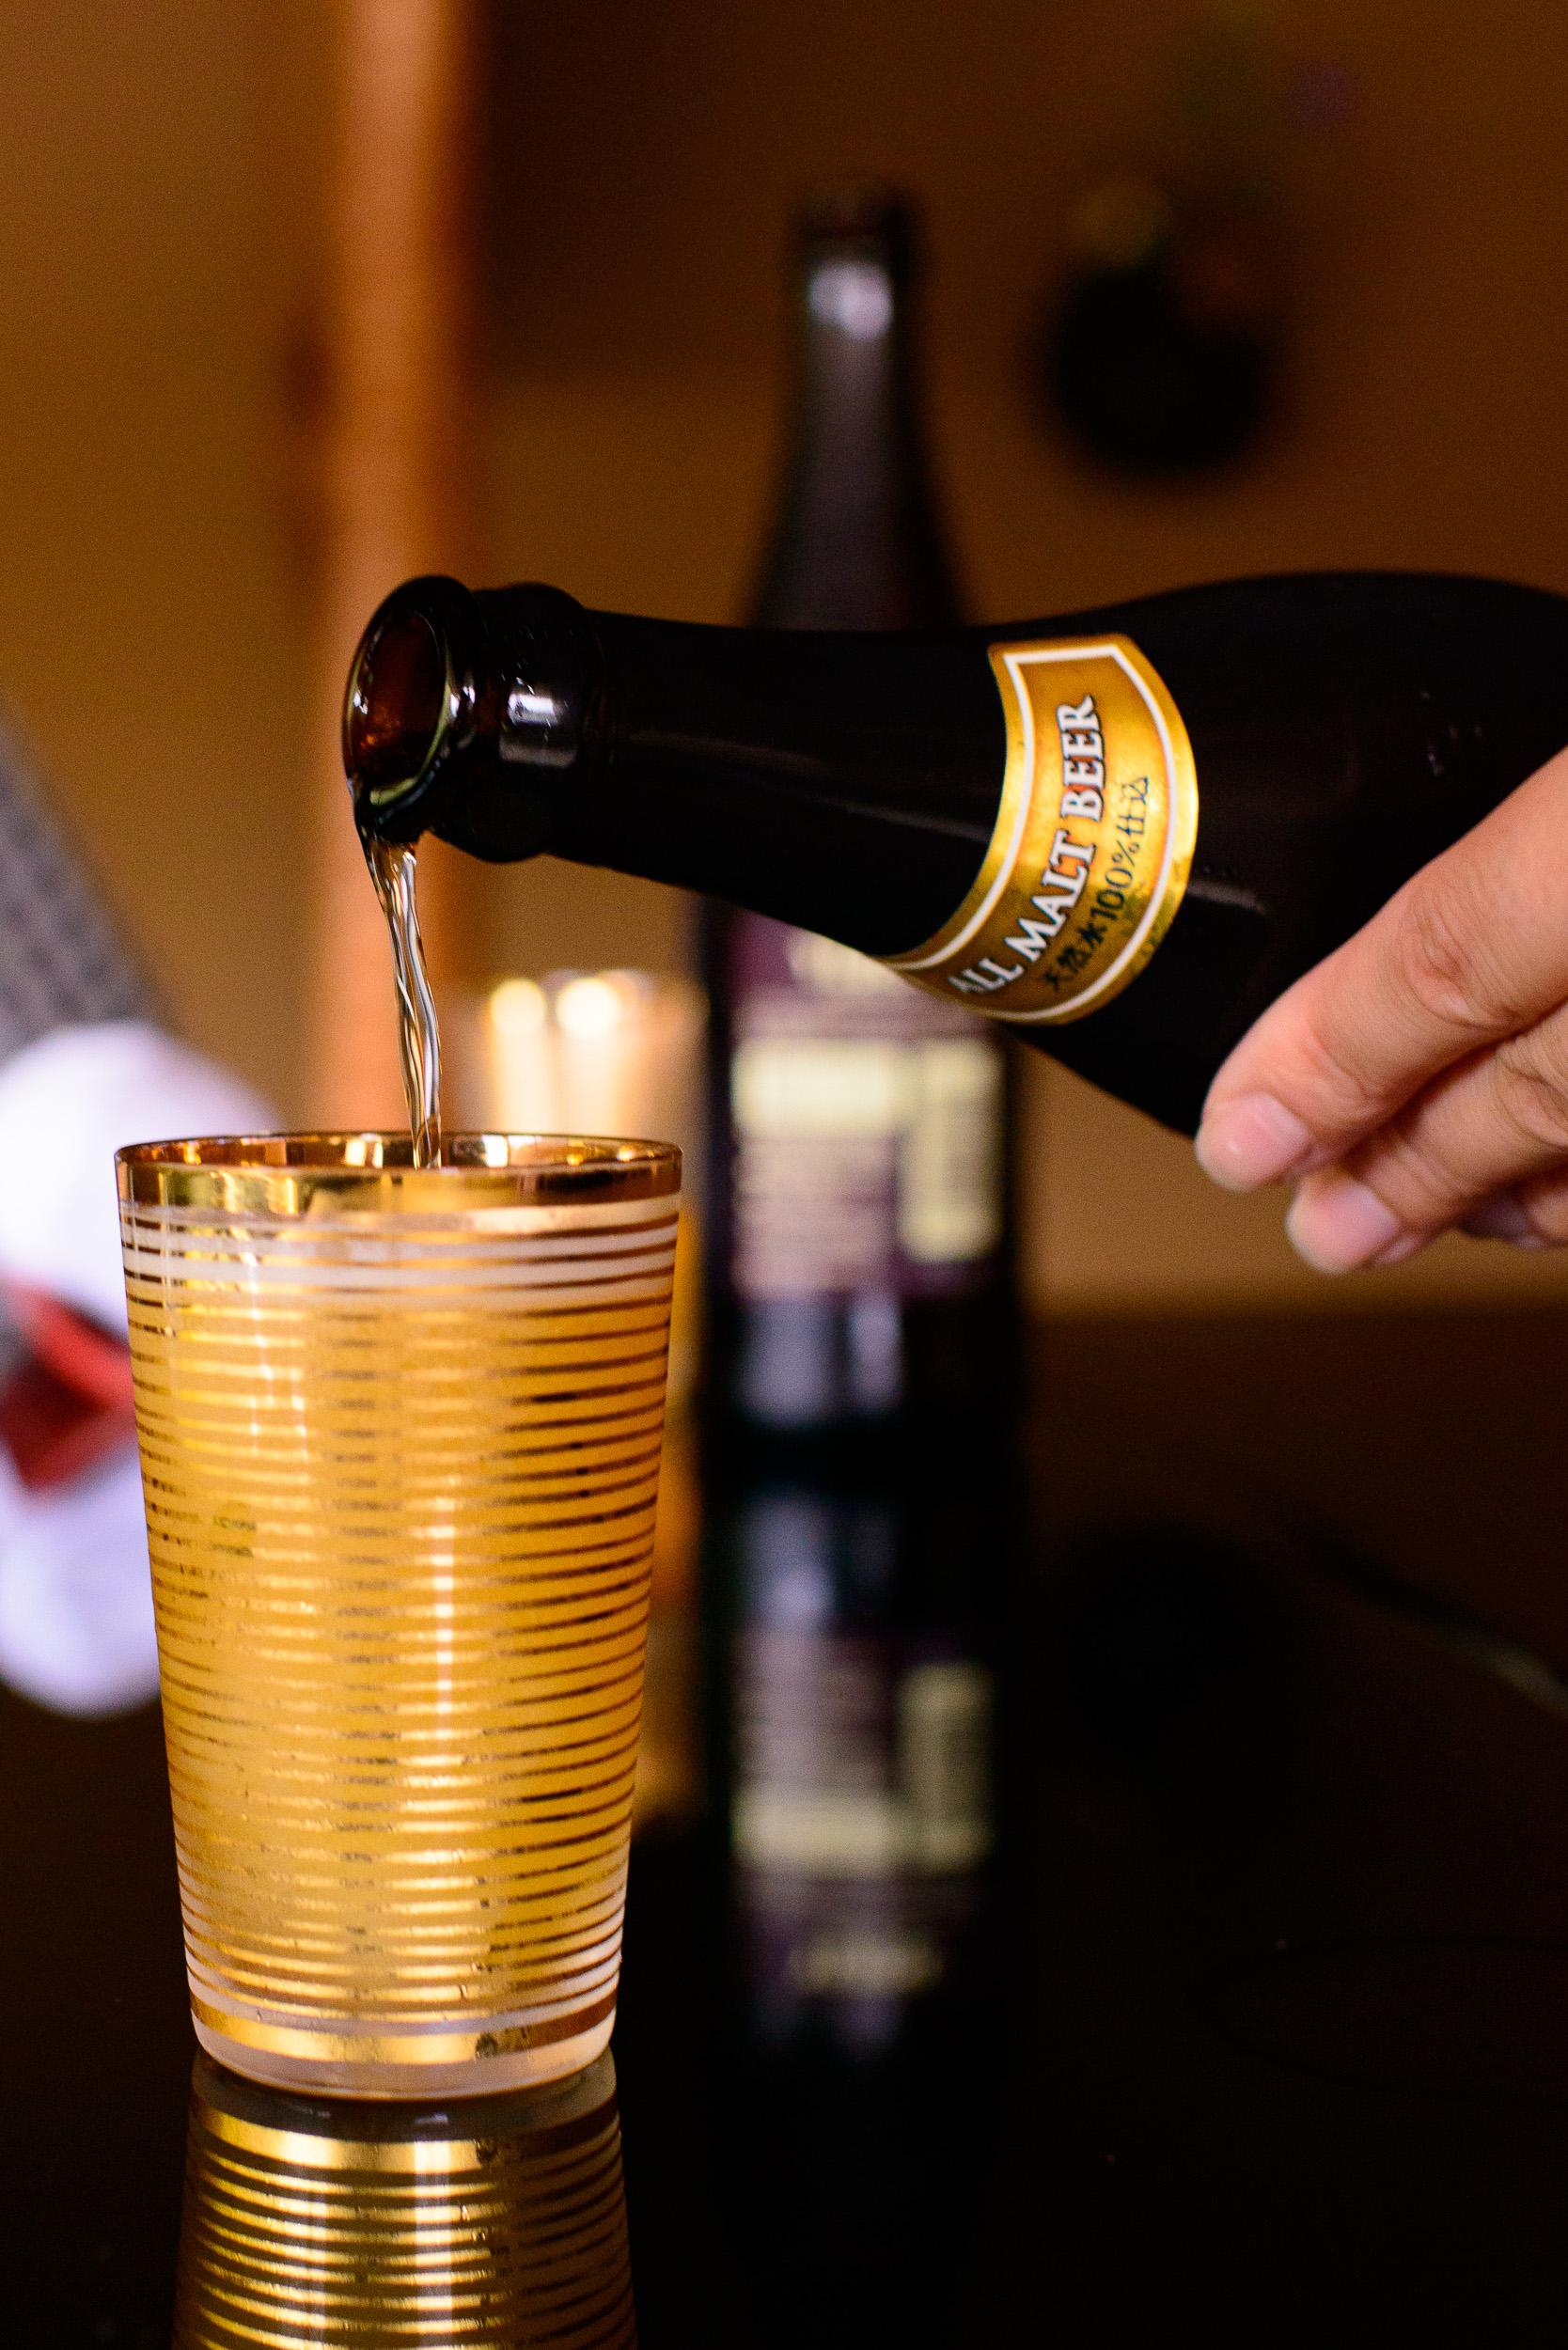 Suntory malt beer